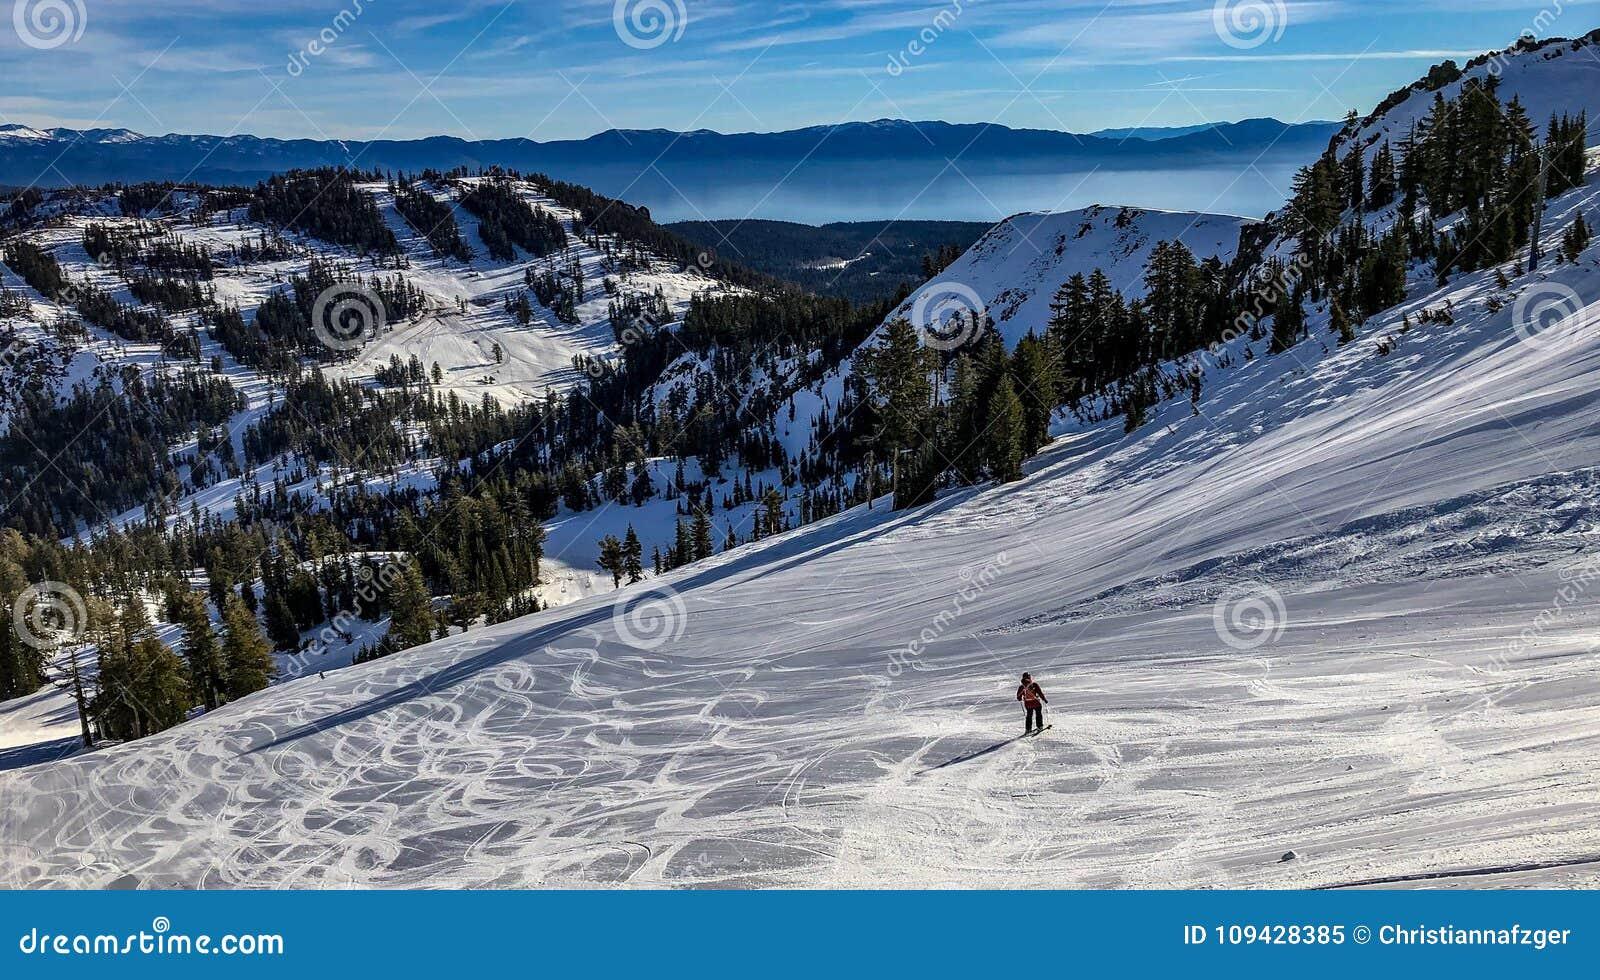 downhill skiing at alpine meadows ski resort above lake tahoe stock